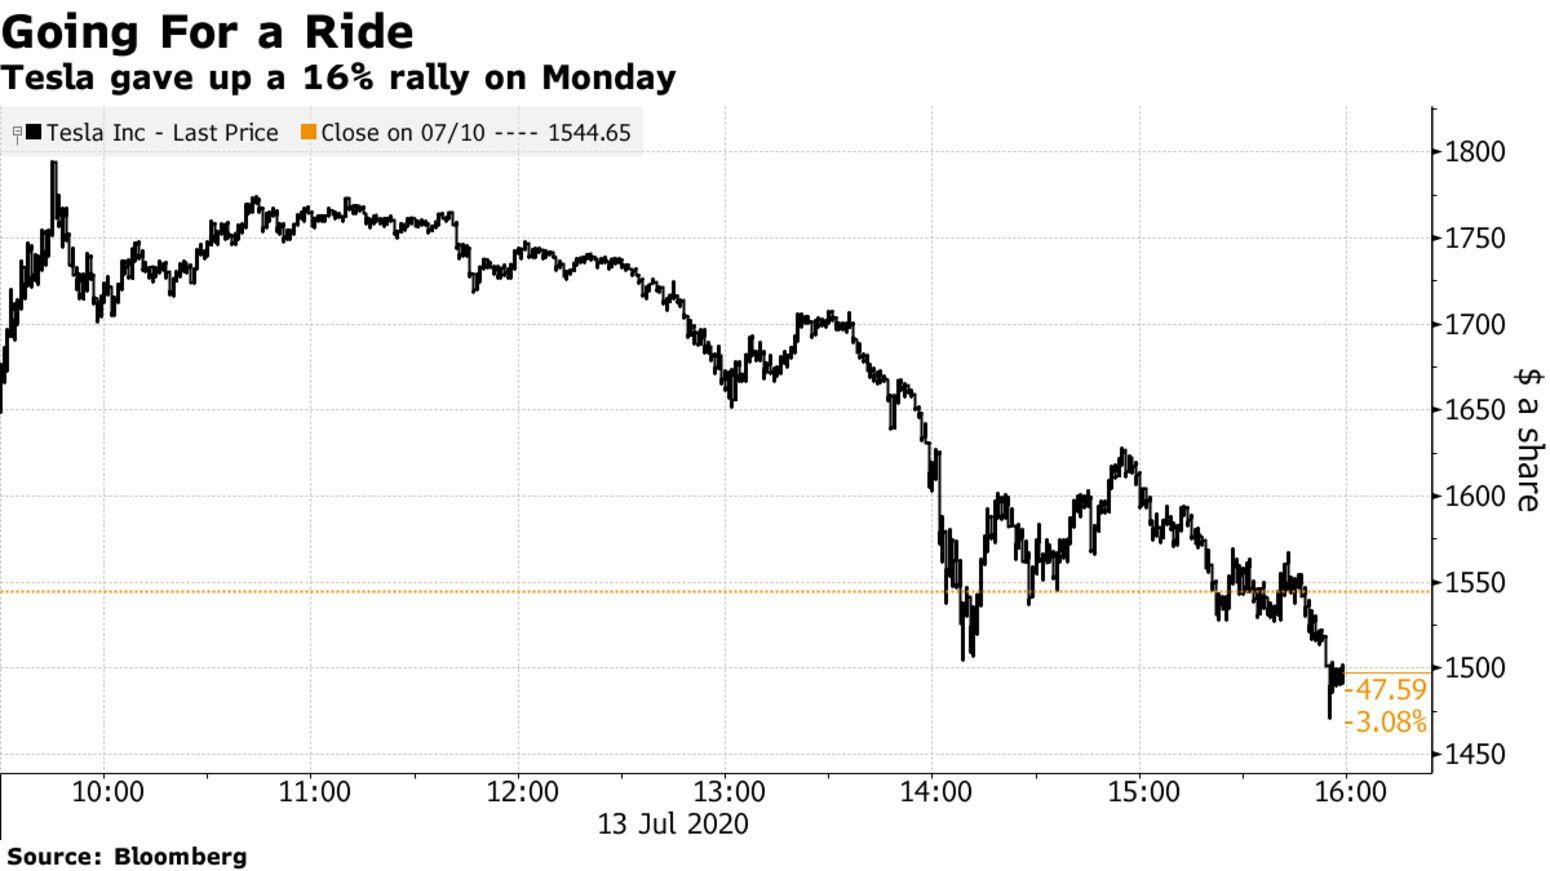 Tesla gave up a 16% rally on Monday